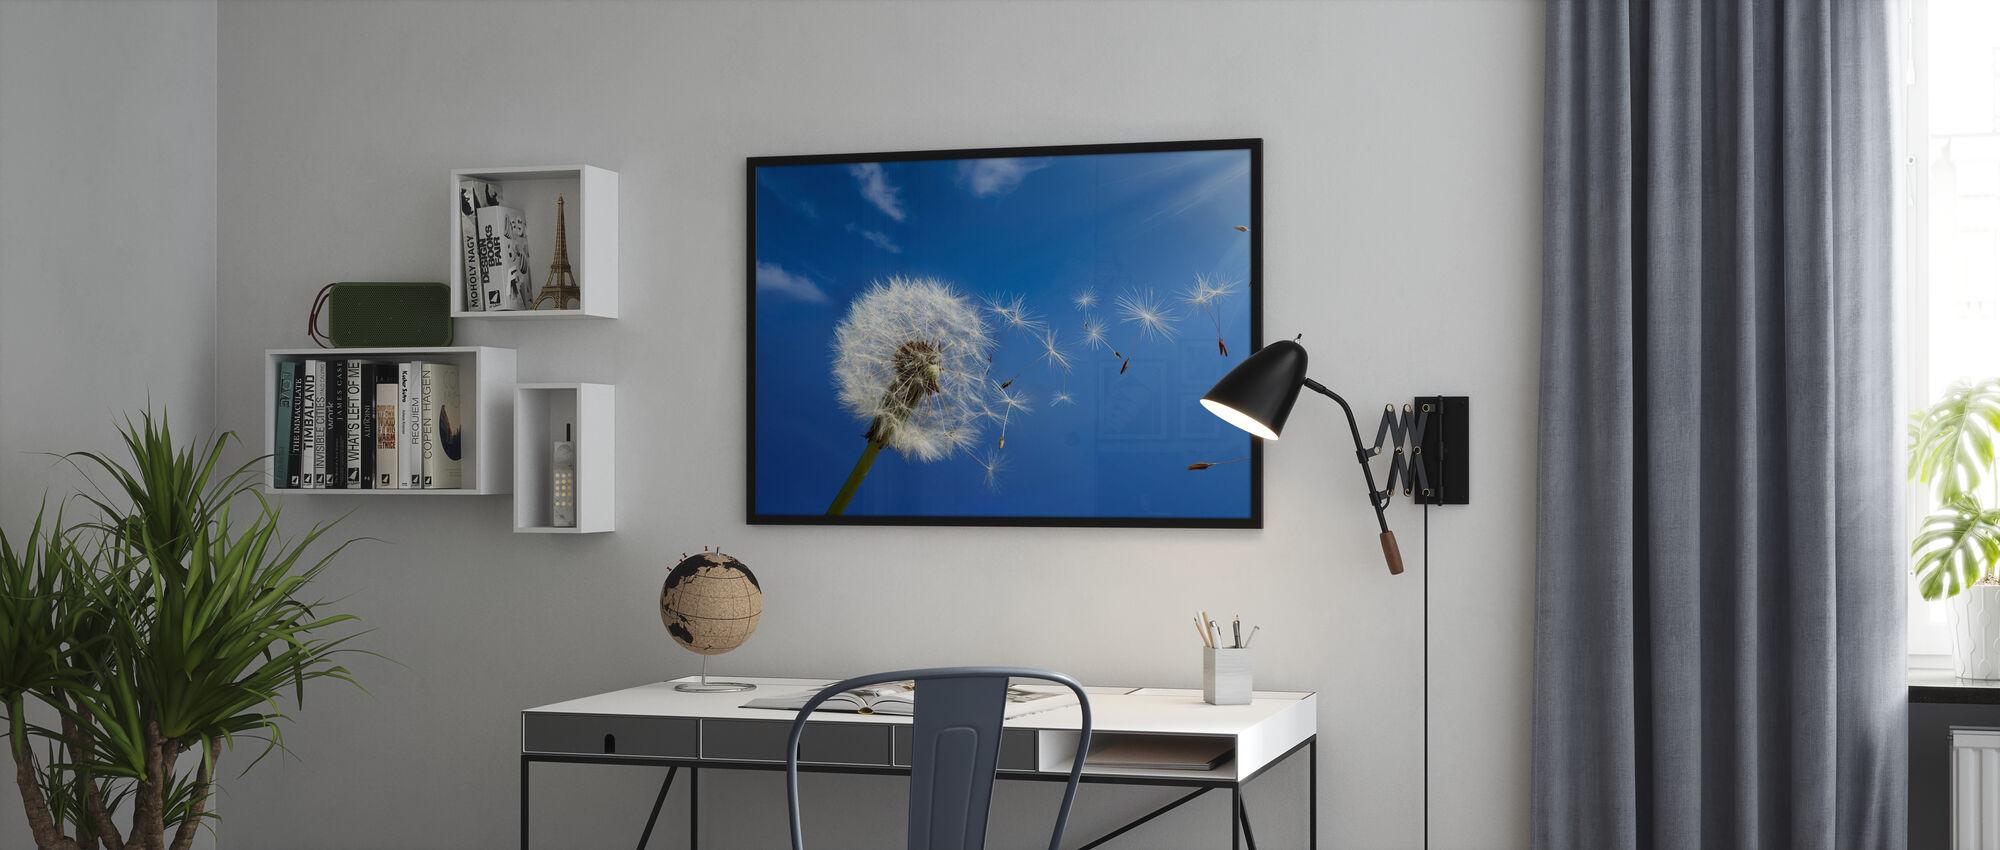 Dreams of Dandelion - Poster - Office